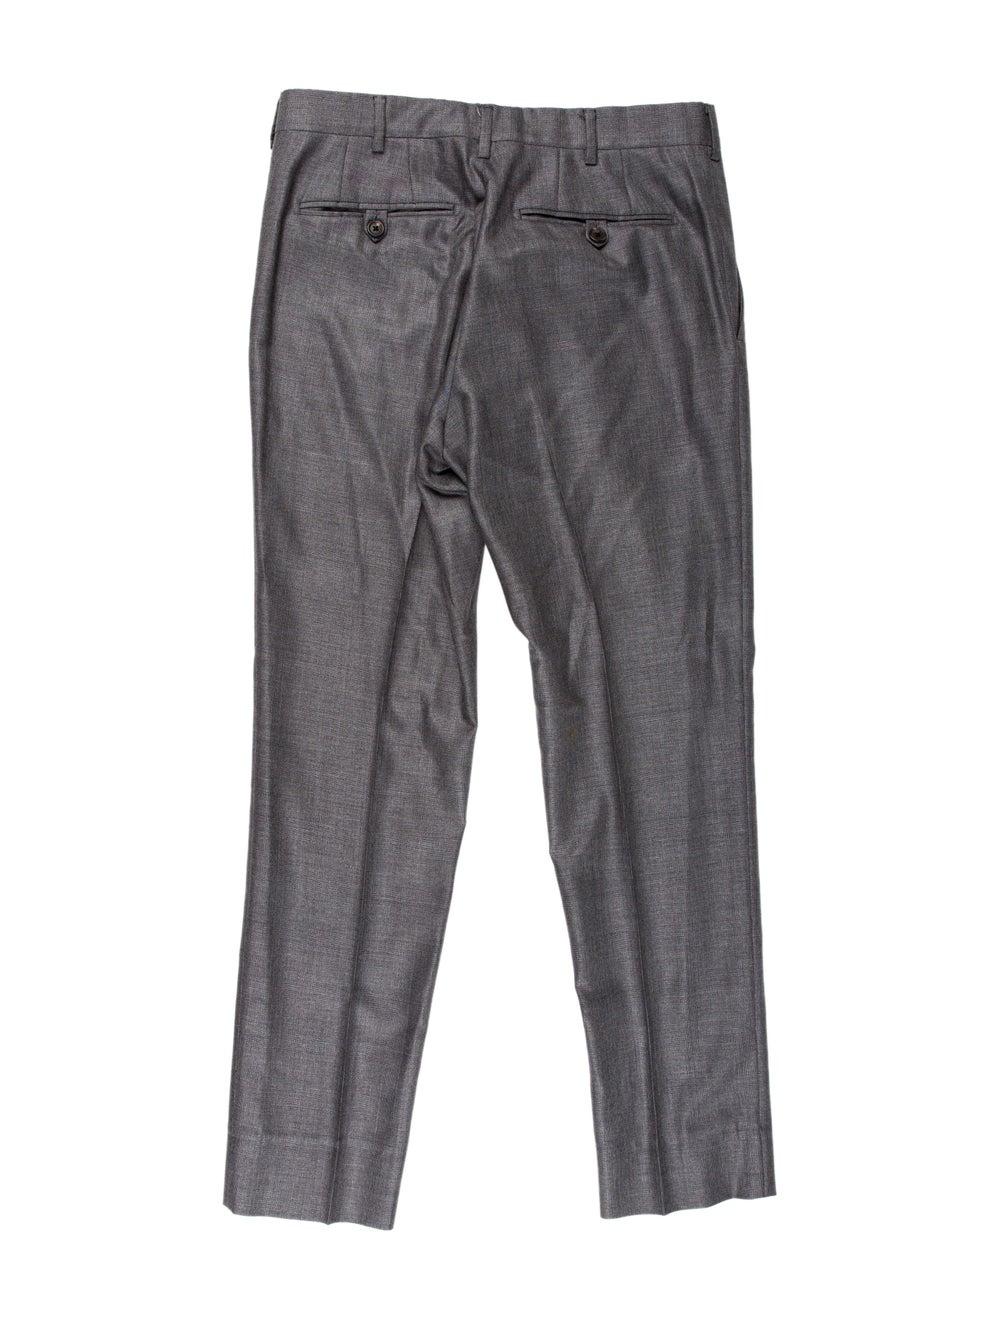 Prada Wool-Blend Two-Piece Suit grey - image 4